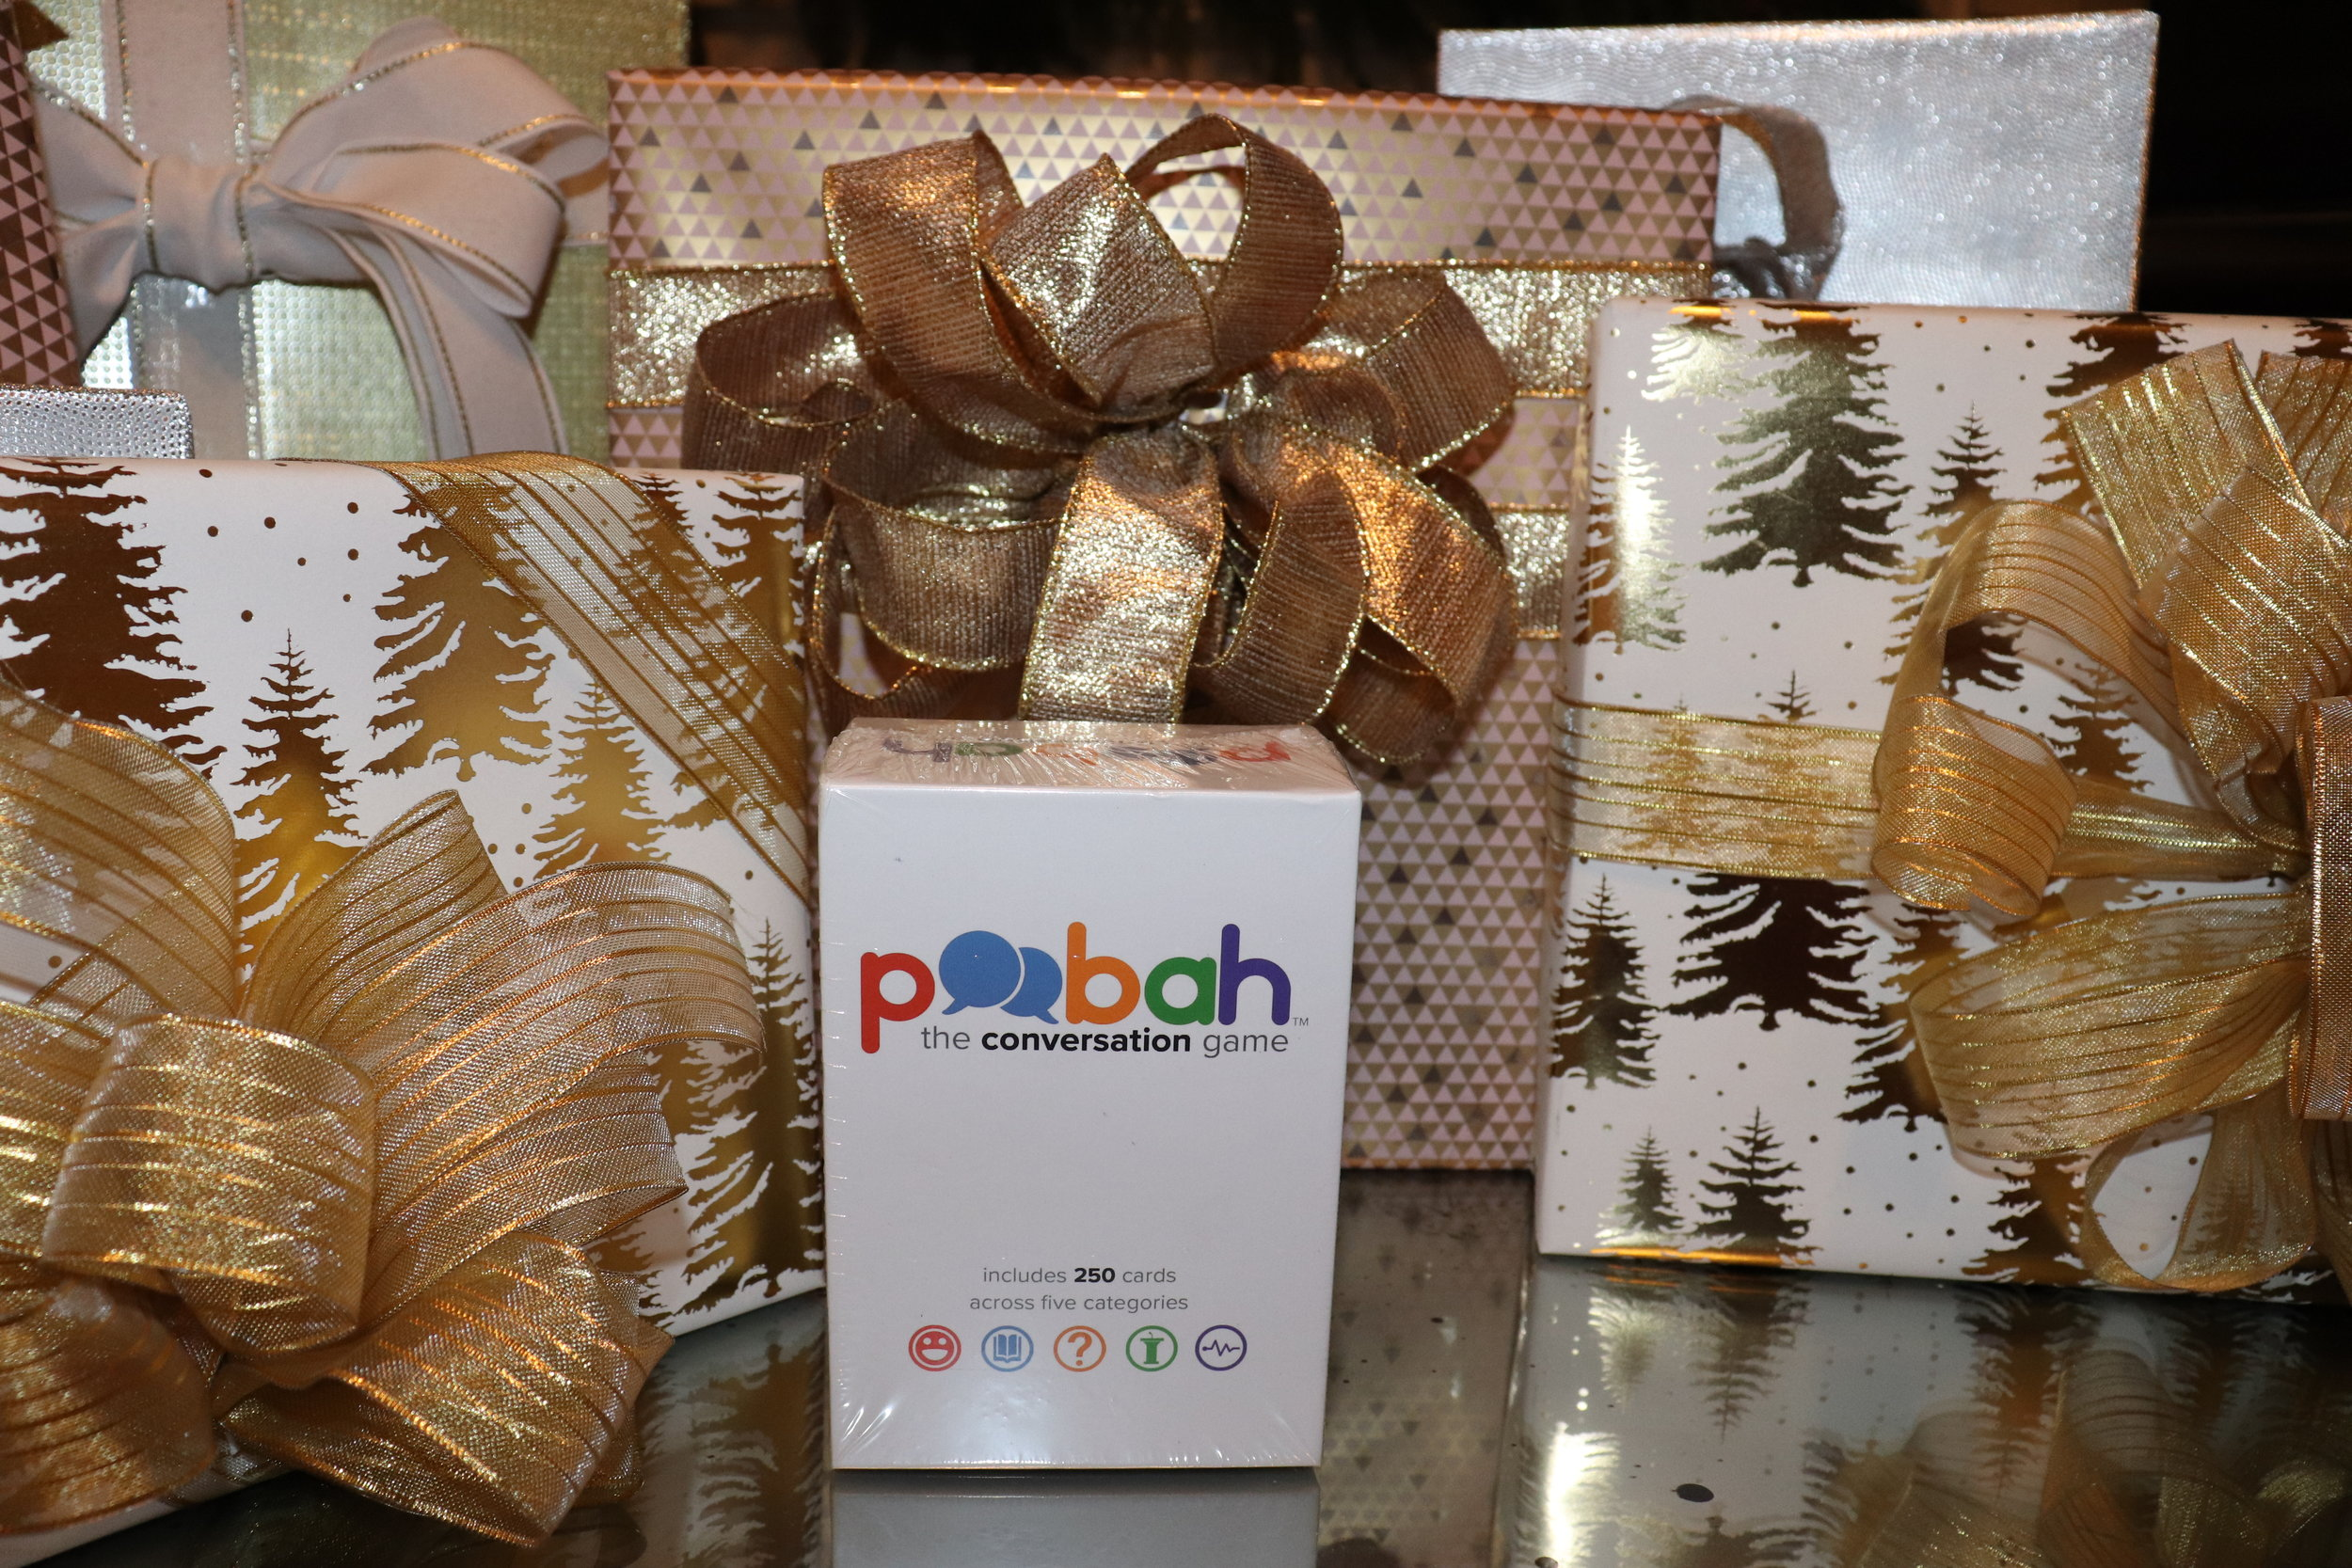 Poobah Card Game